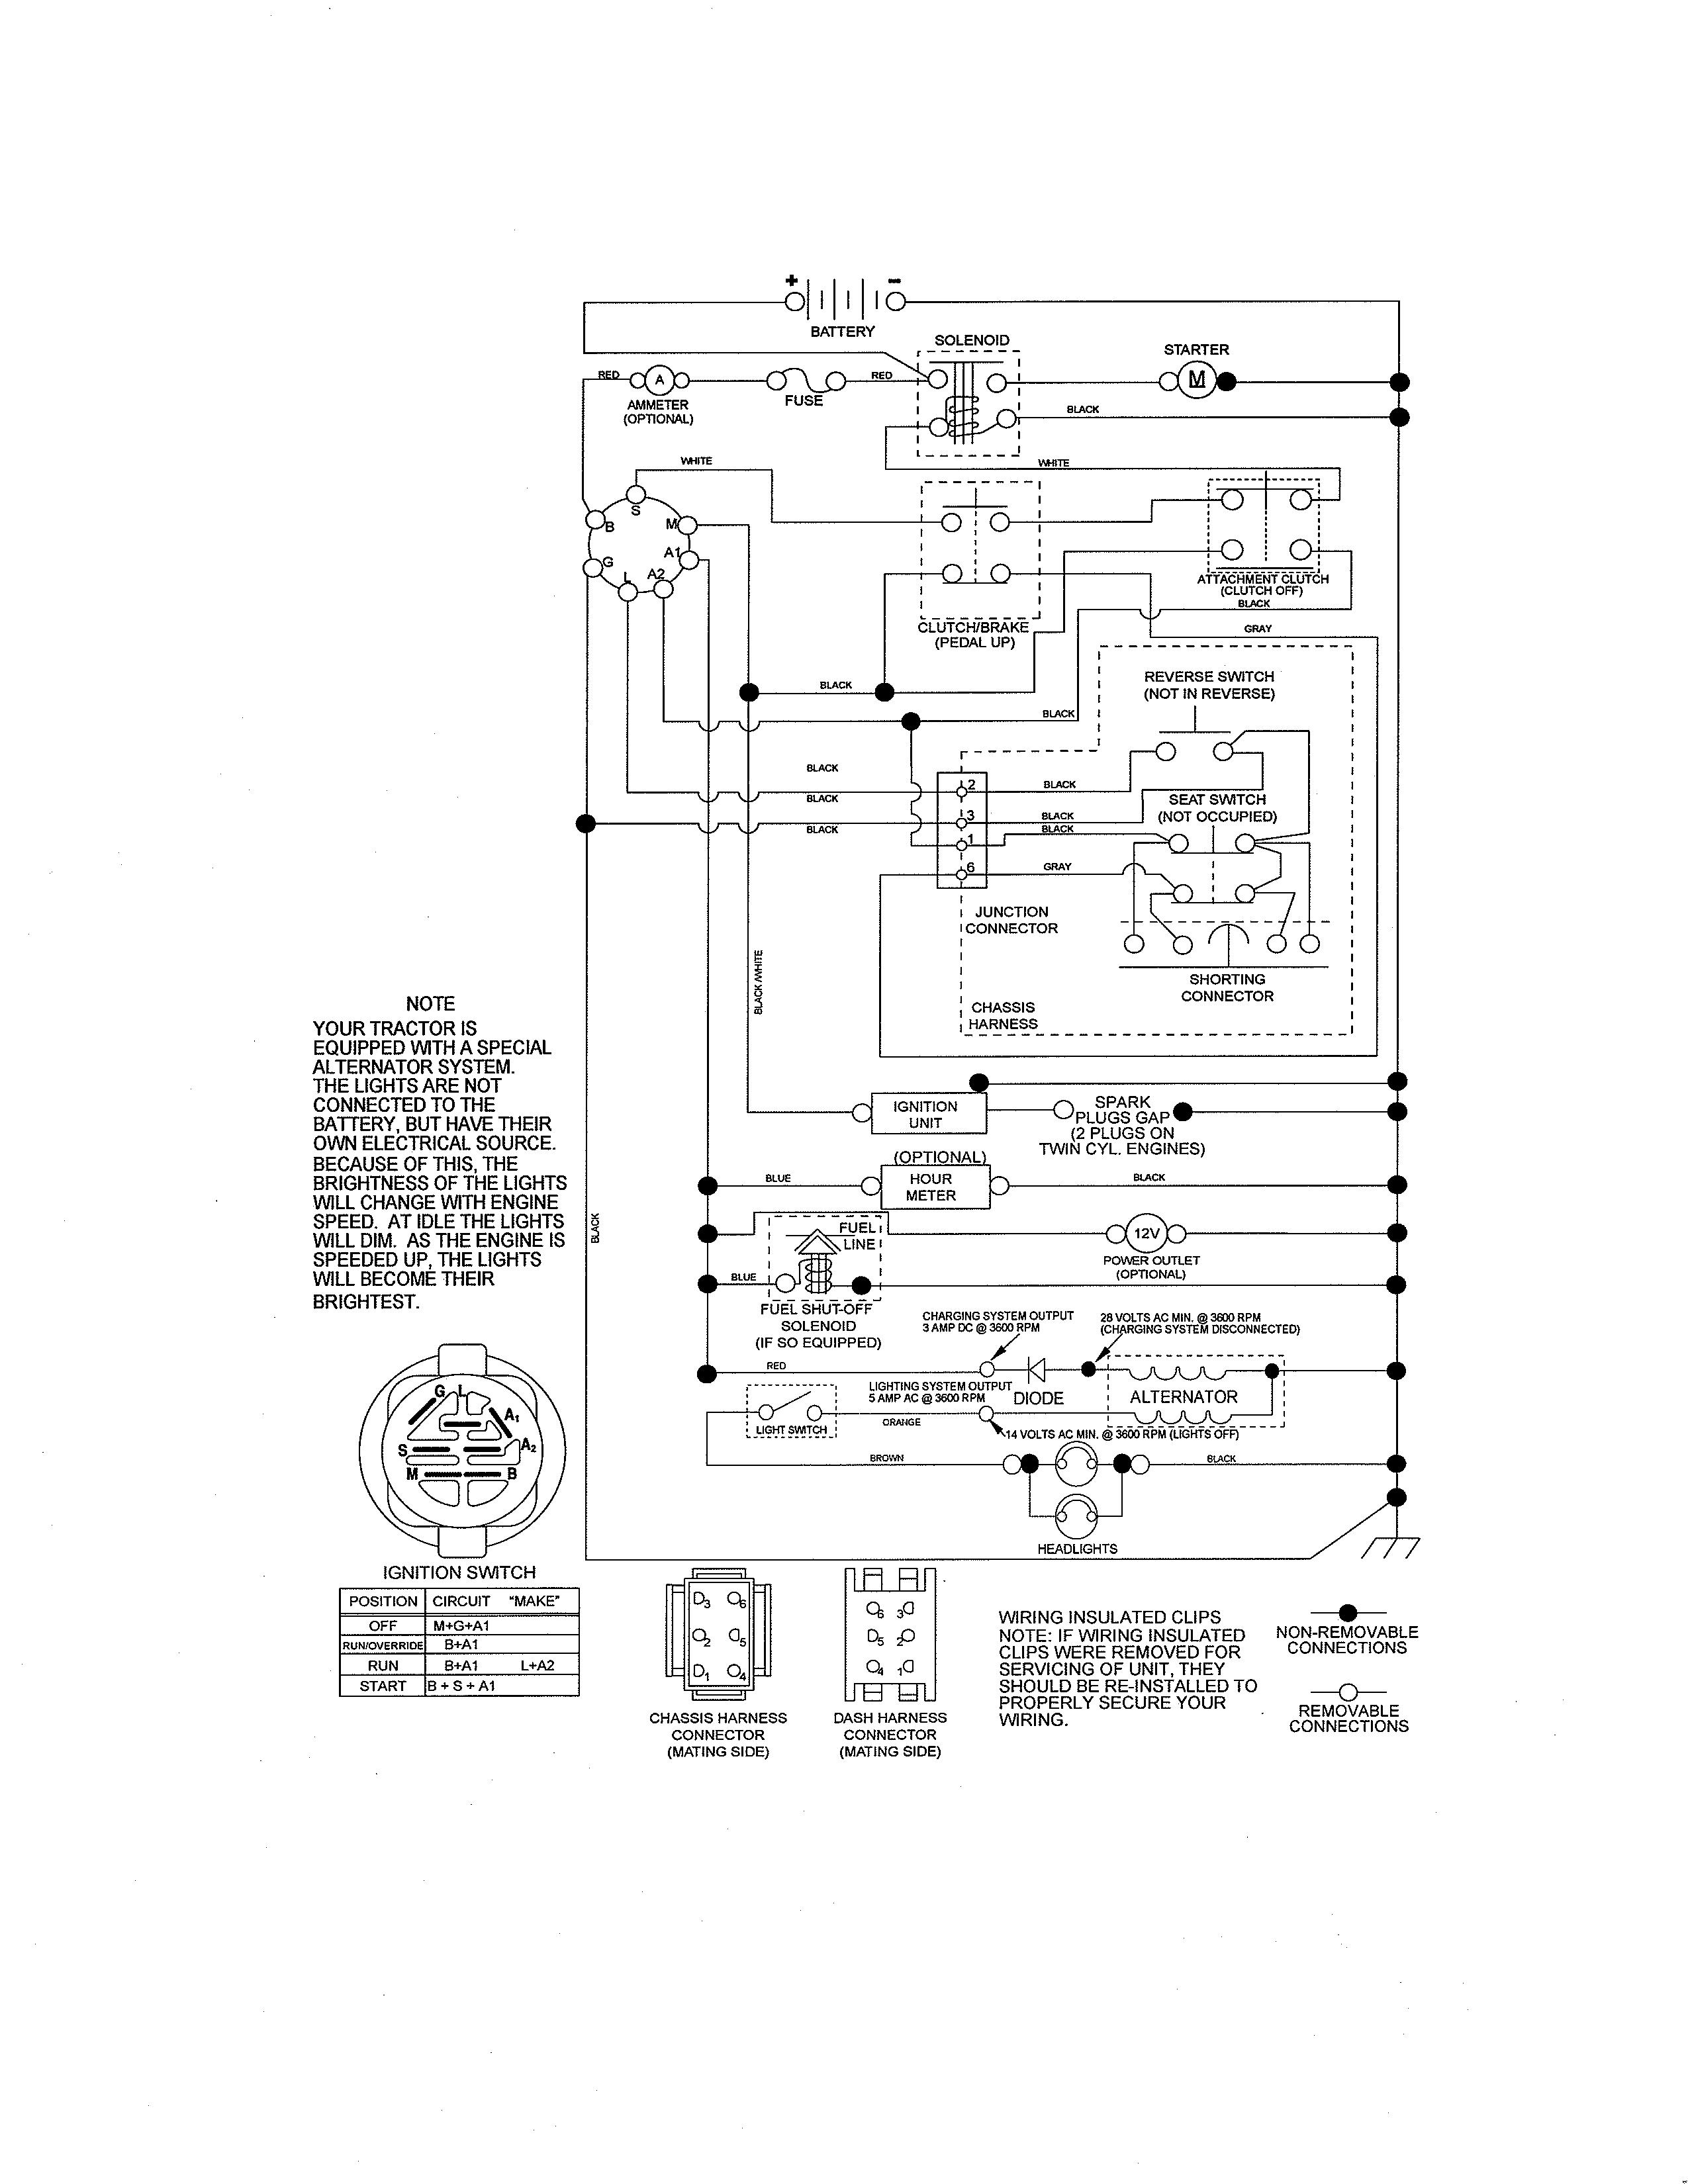 craftsman lawn mower owner manual 944